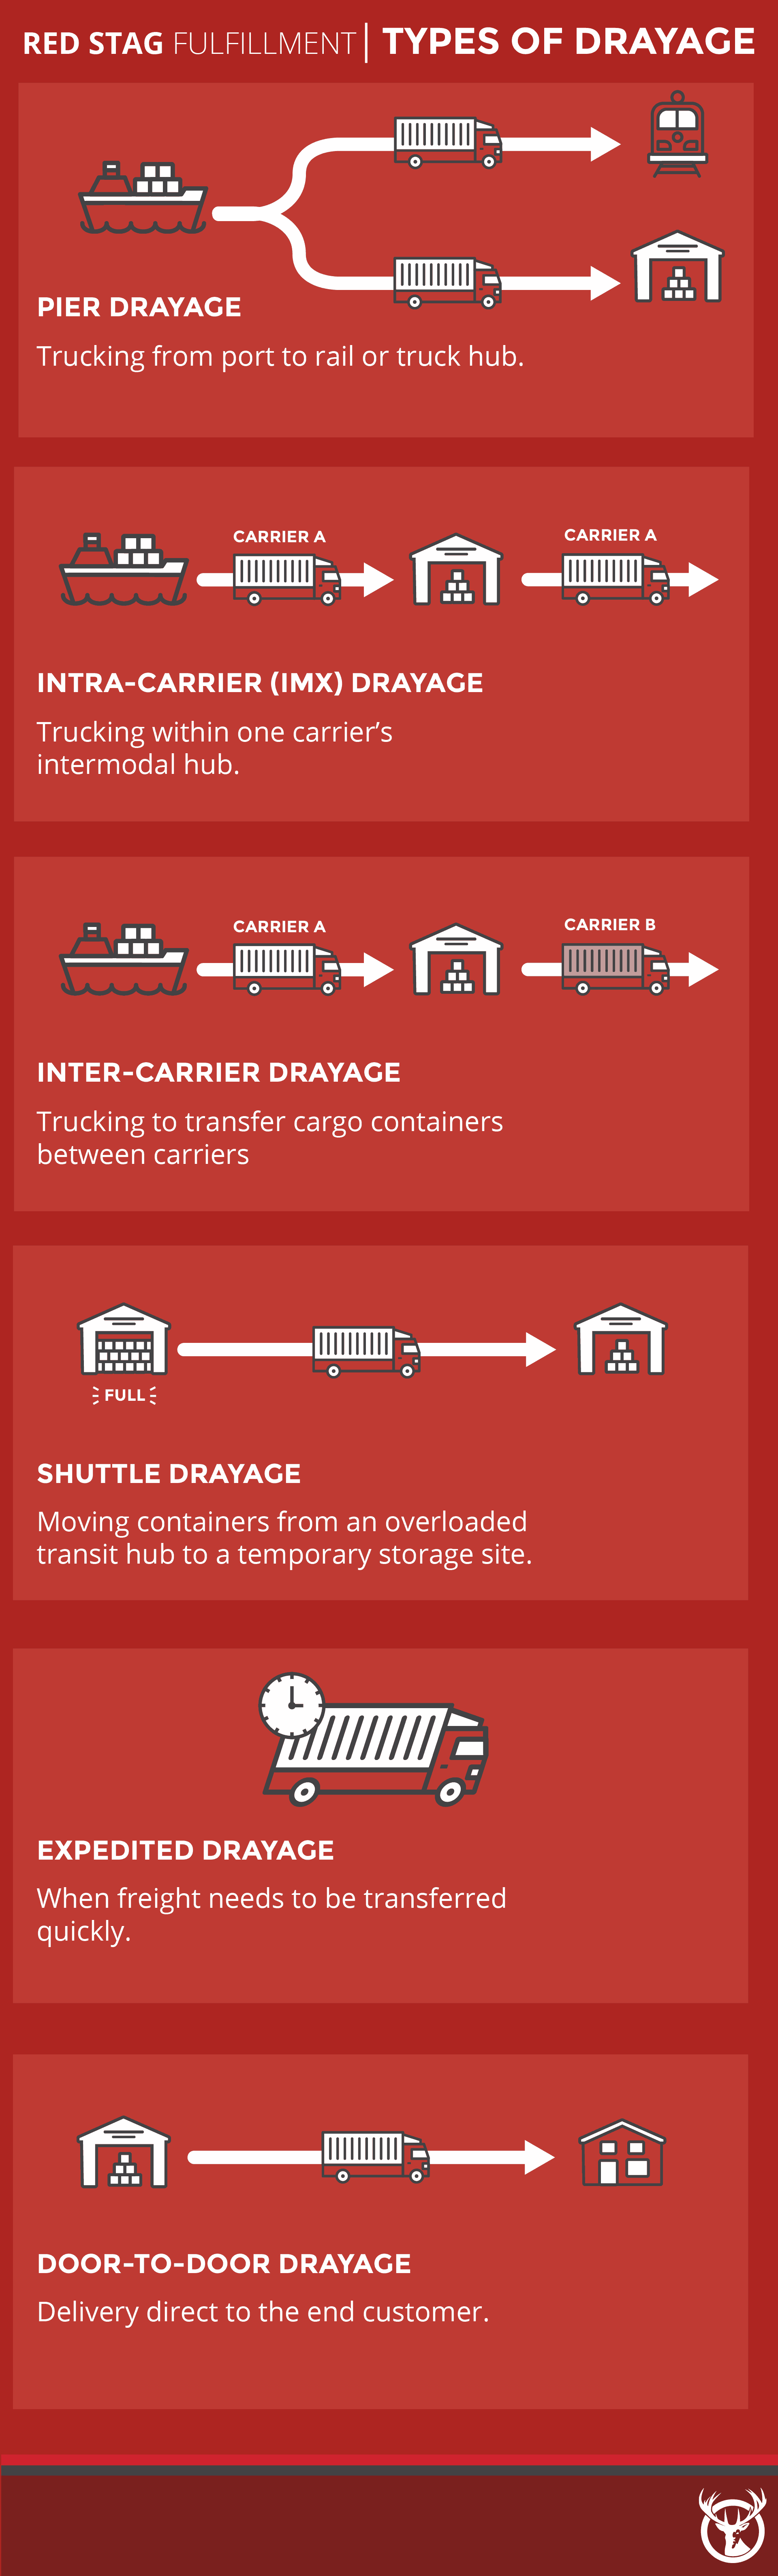 Types of drayage